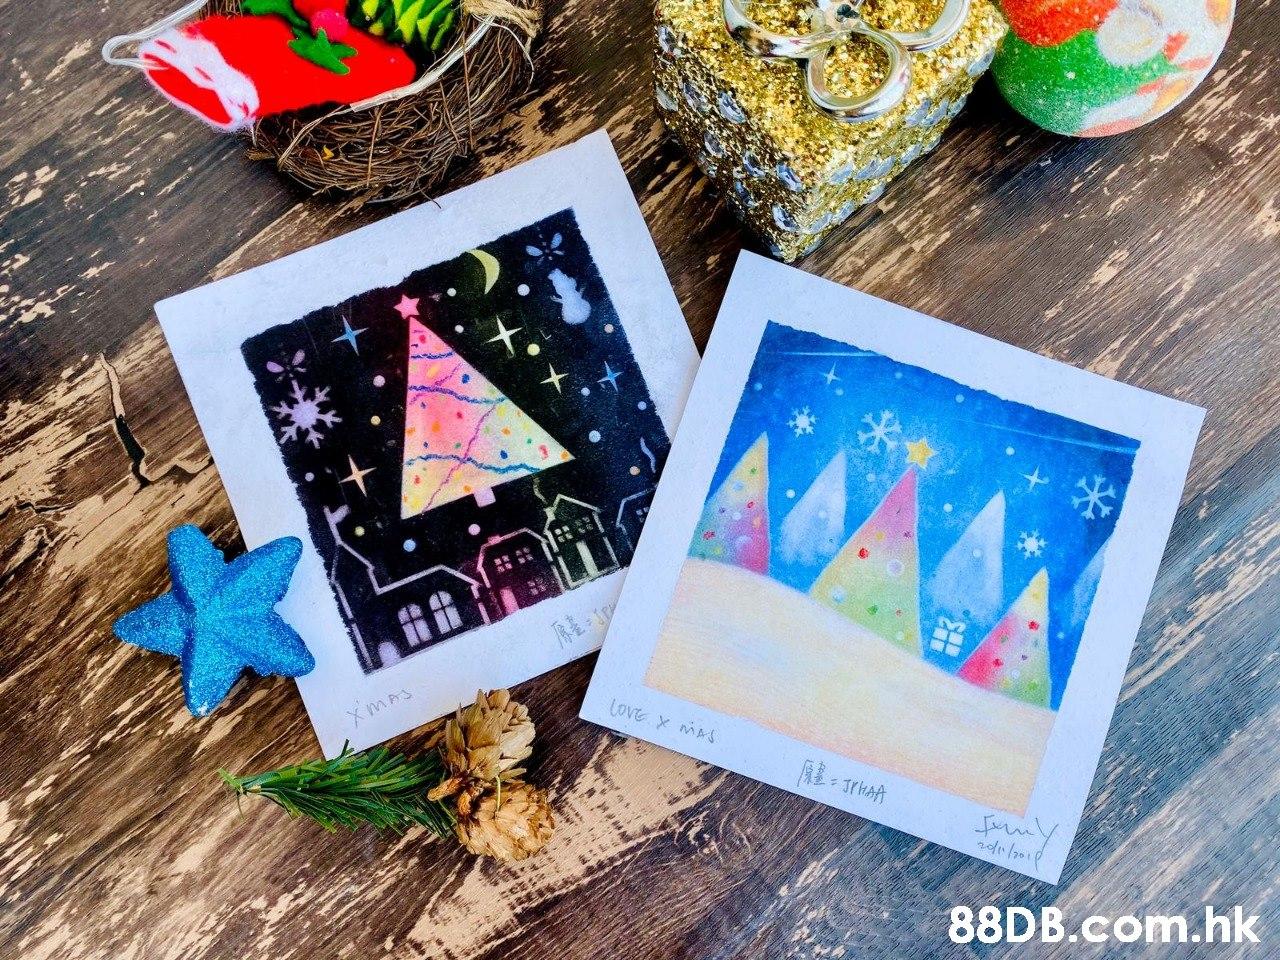 Love x MAS XMAS 2/1/2018 .hk  Leaf,Picture frame,Tree,Art,